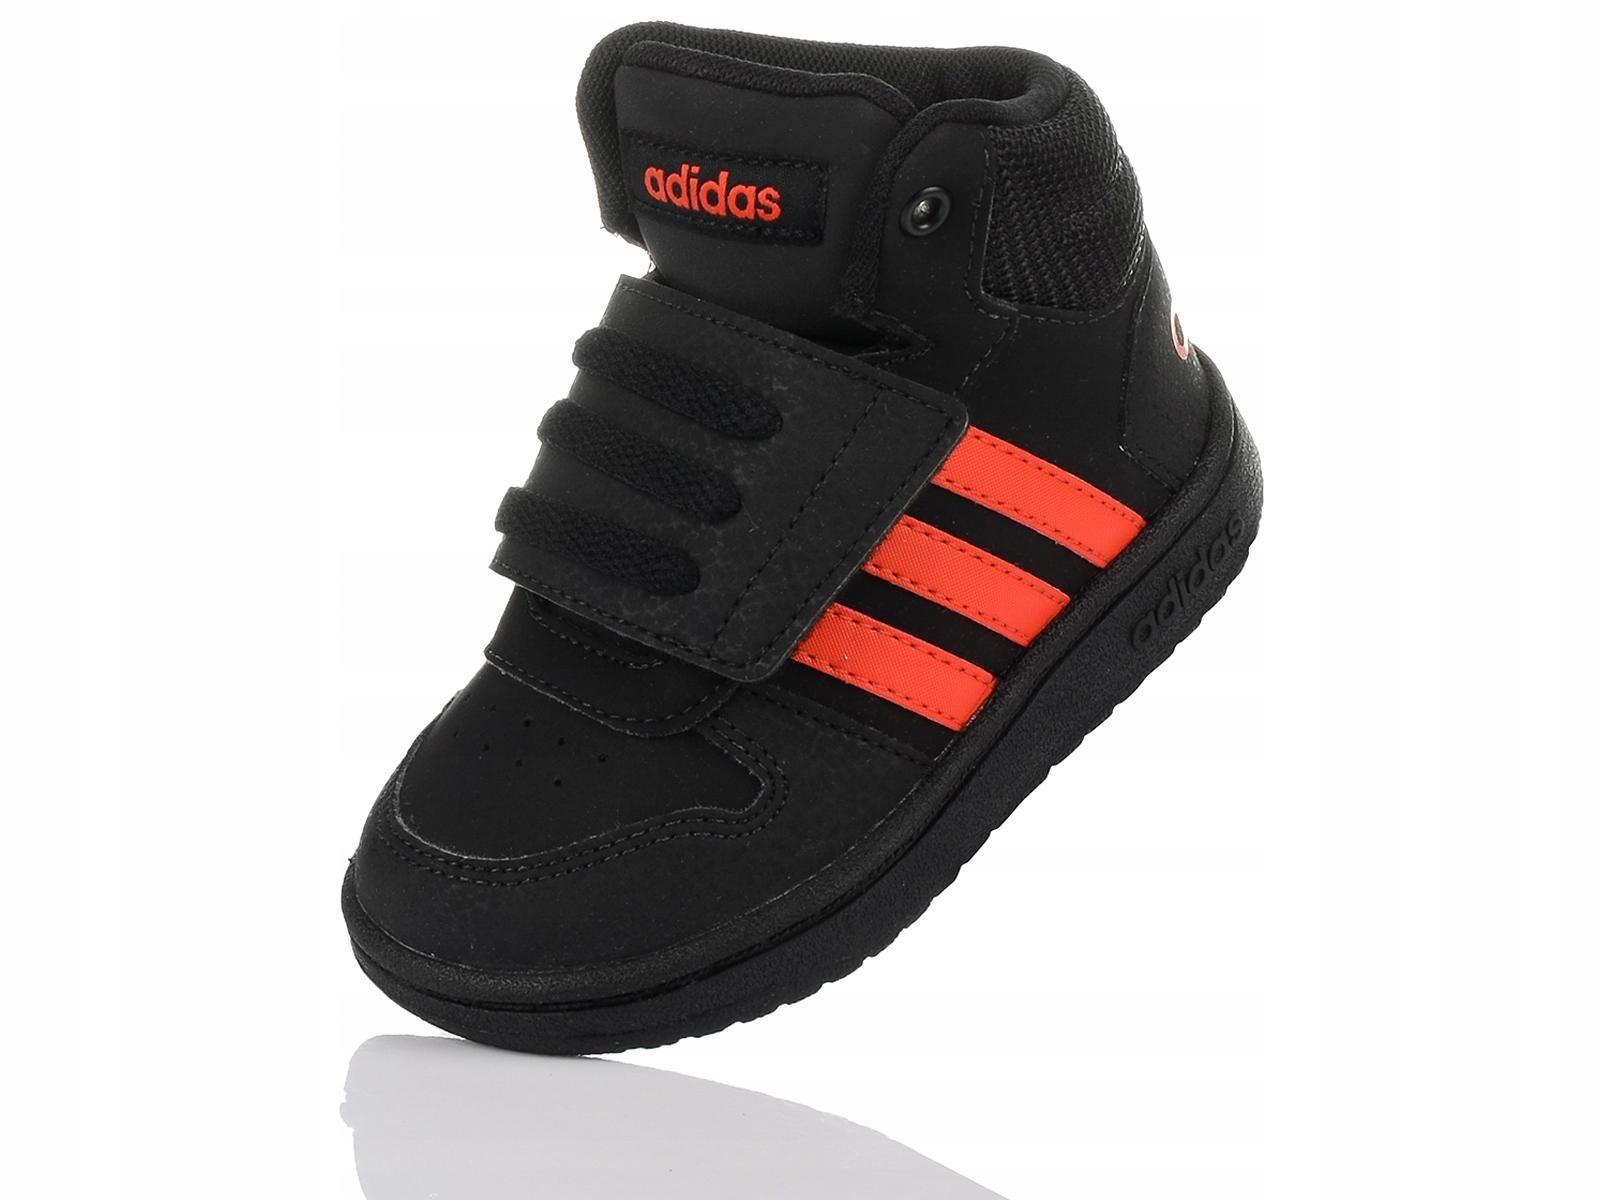 buty dziecięce adidas VS Hoops CMF Mid 2.0 DB1491